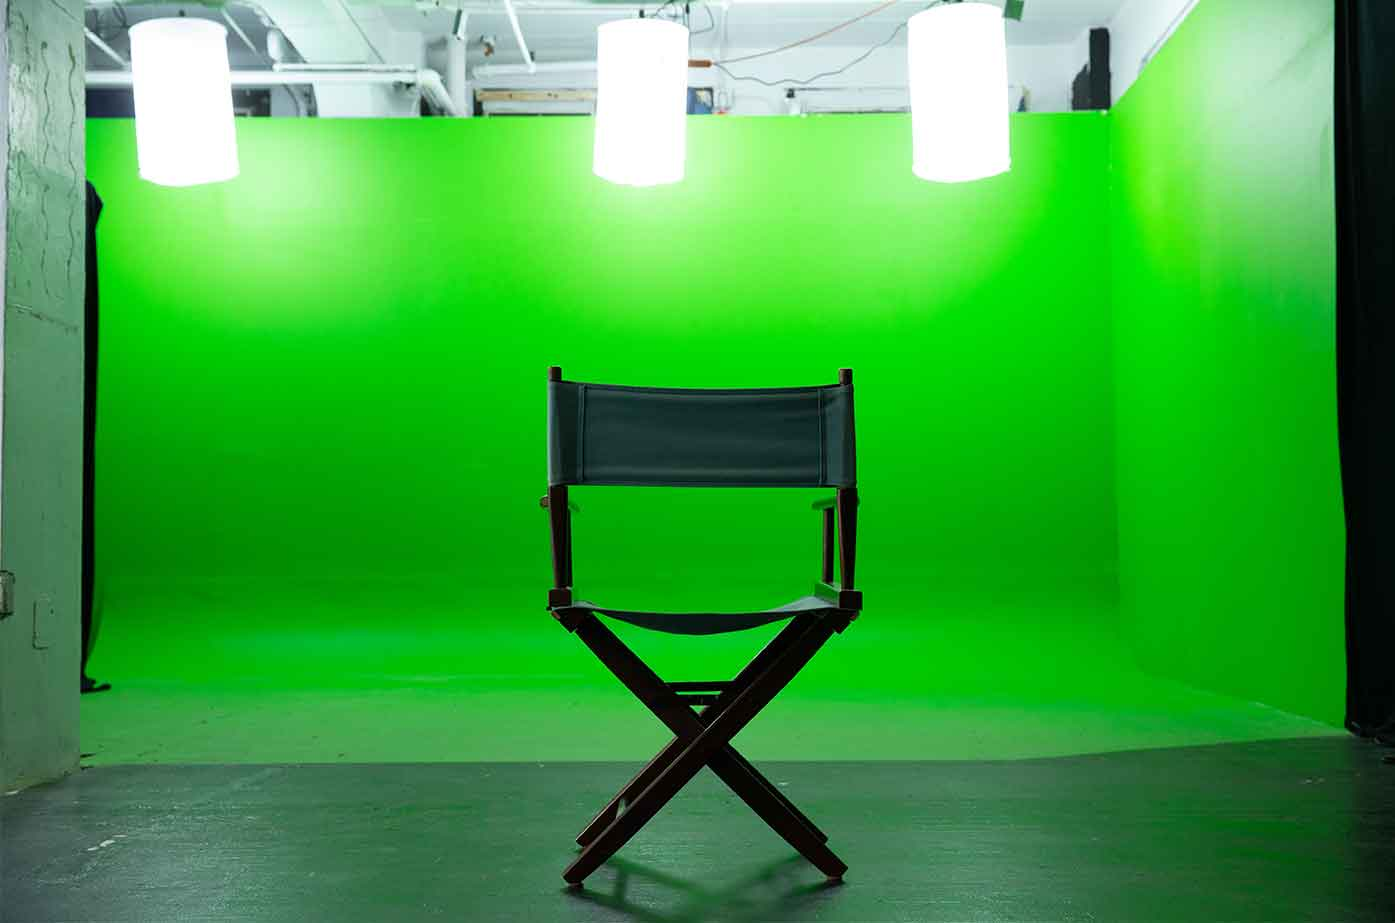 Director's Chair at Midtown Green Screen Studio